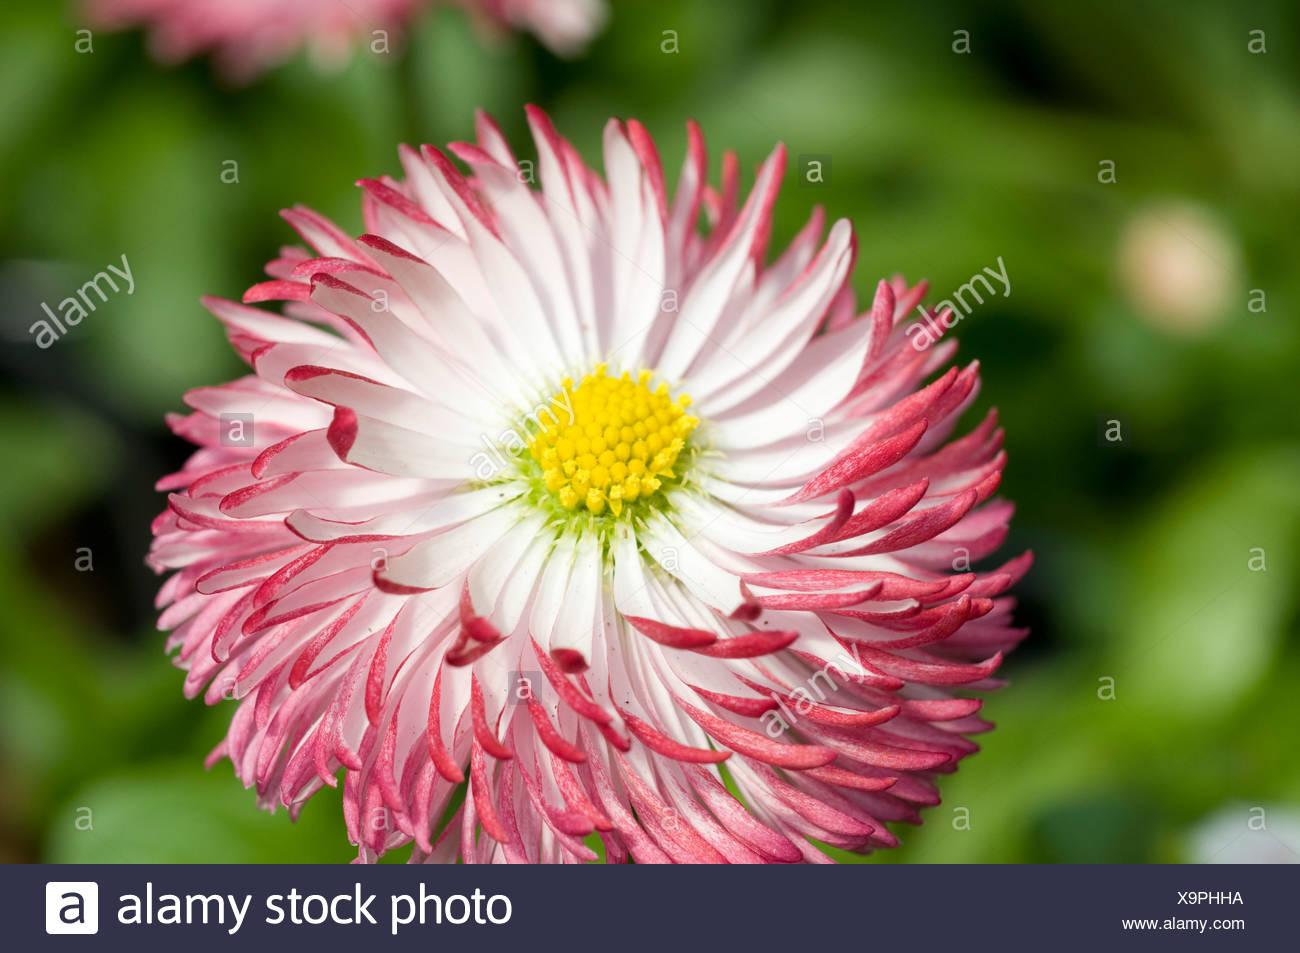 Pink english daisy flower stock photo 281394550 alamy pink english daisy flower izmirmasajfo